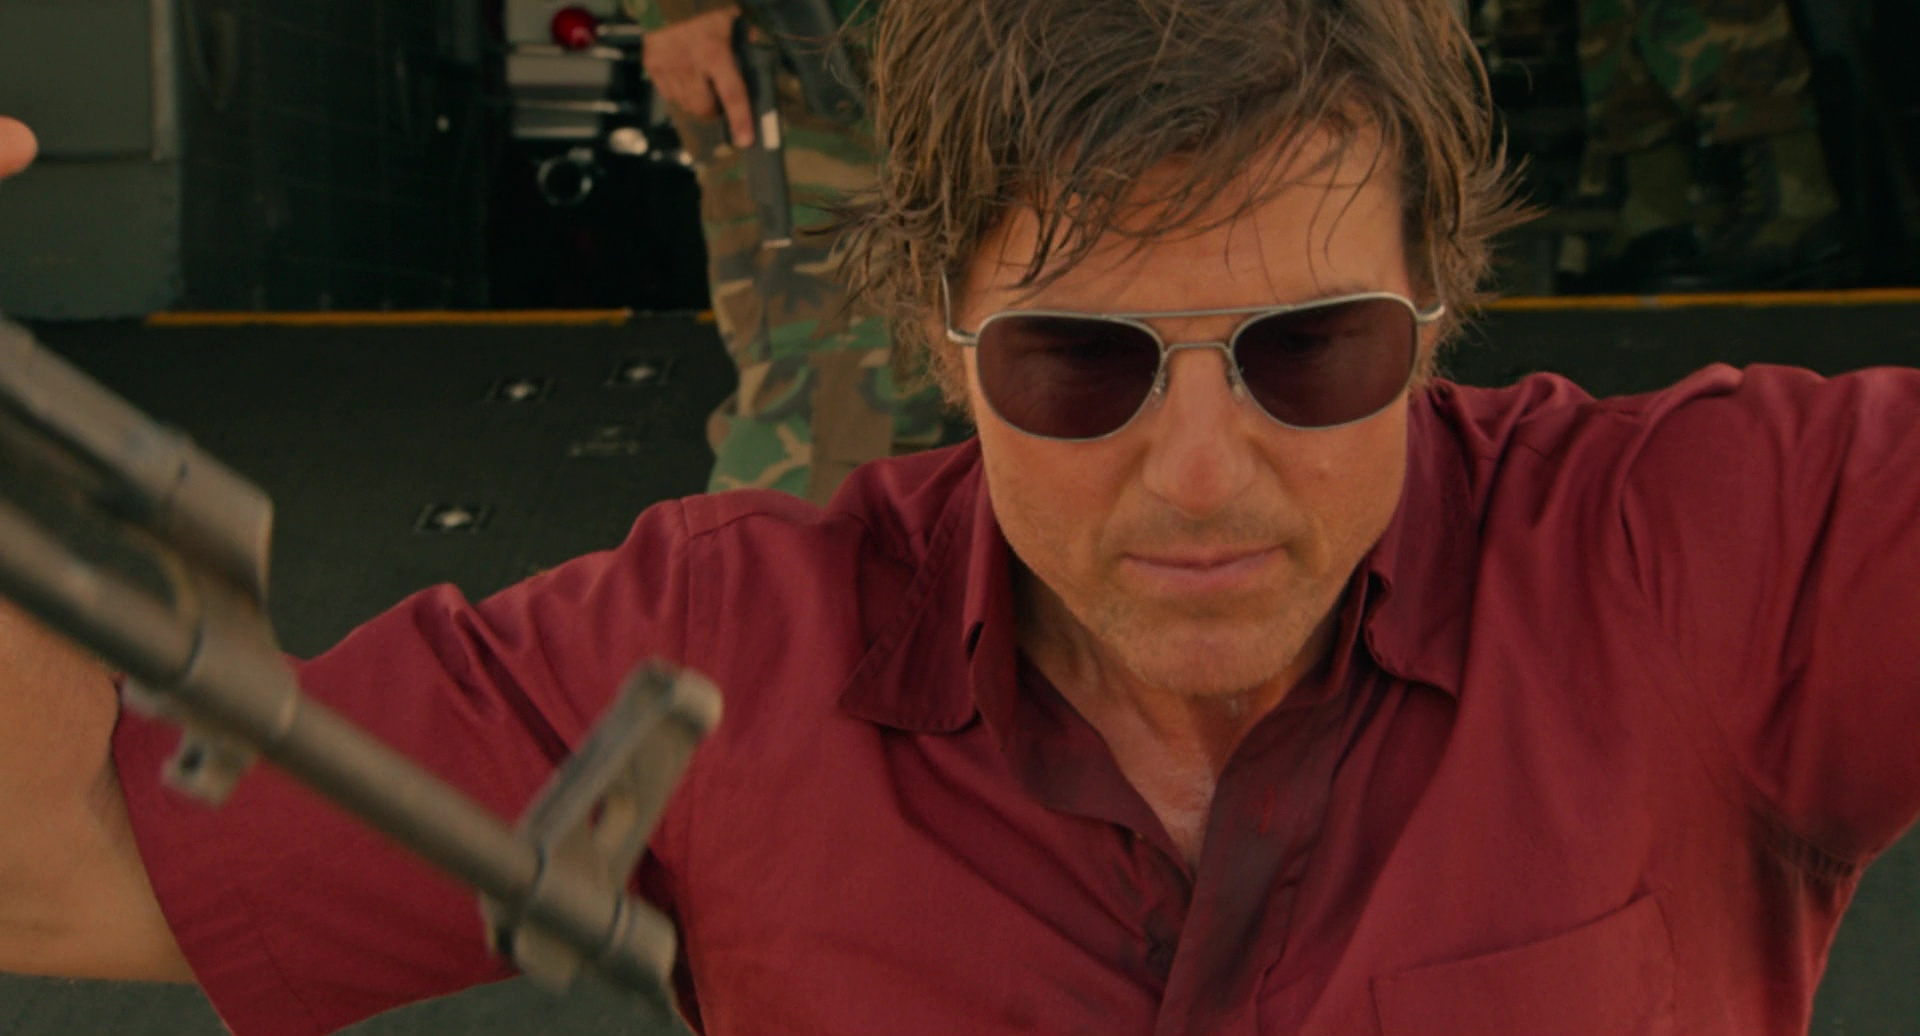 Randolph Engineering Aviator Bright Chrome Sunglasses Worn By Tom Cruise In American Made 2017